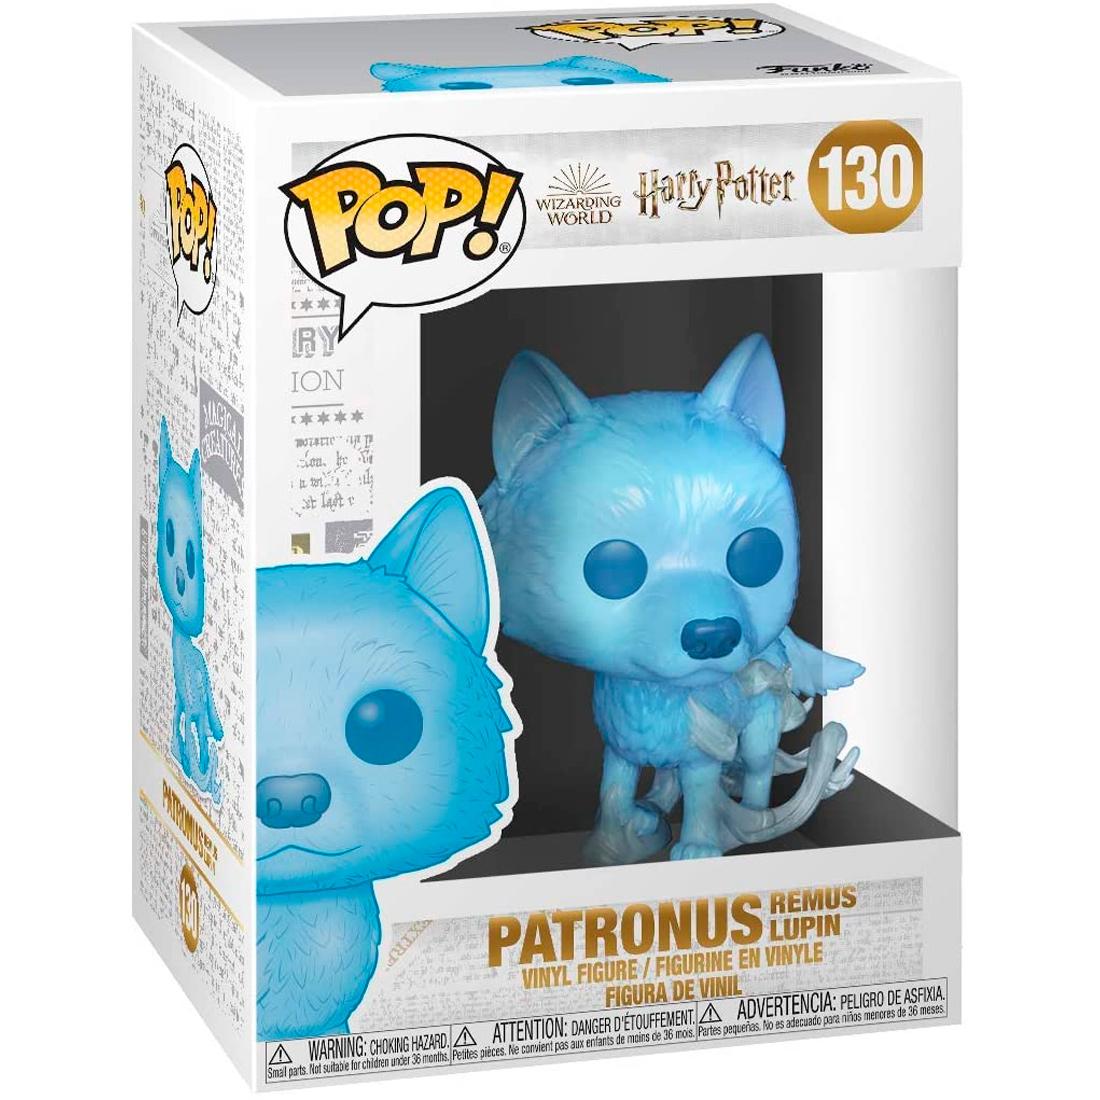 Funko Pop Wizarding World Harry Potter 130 Patronus Remus Lupin